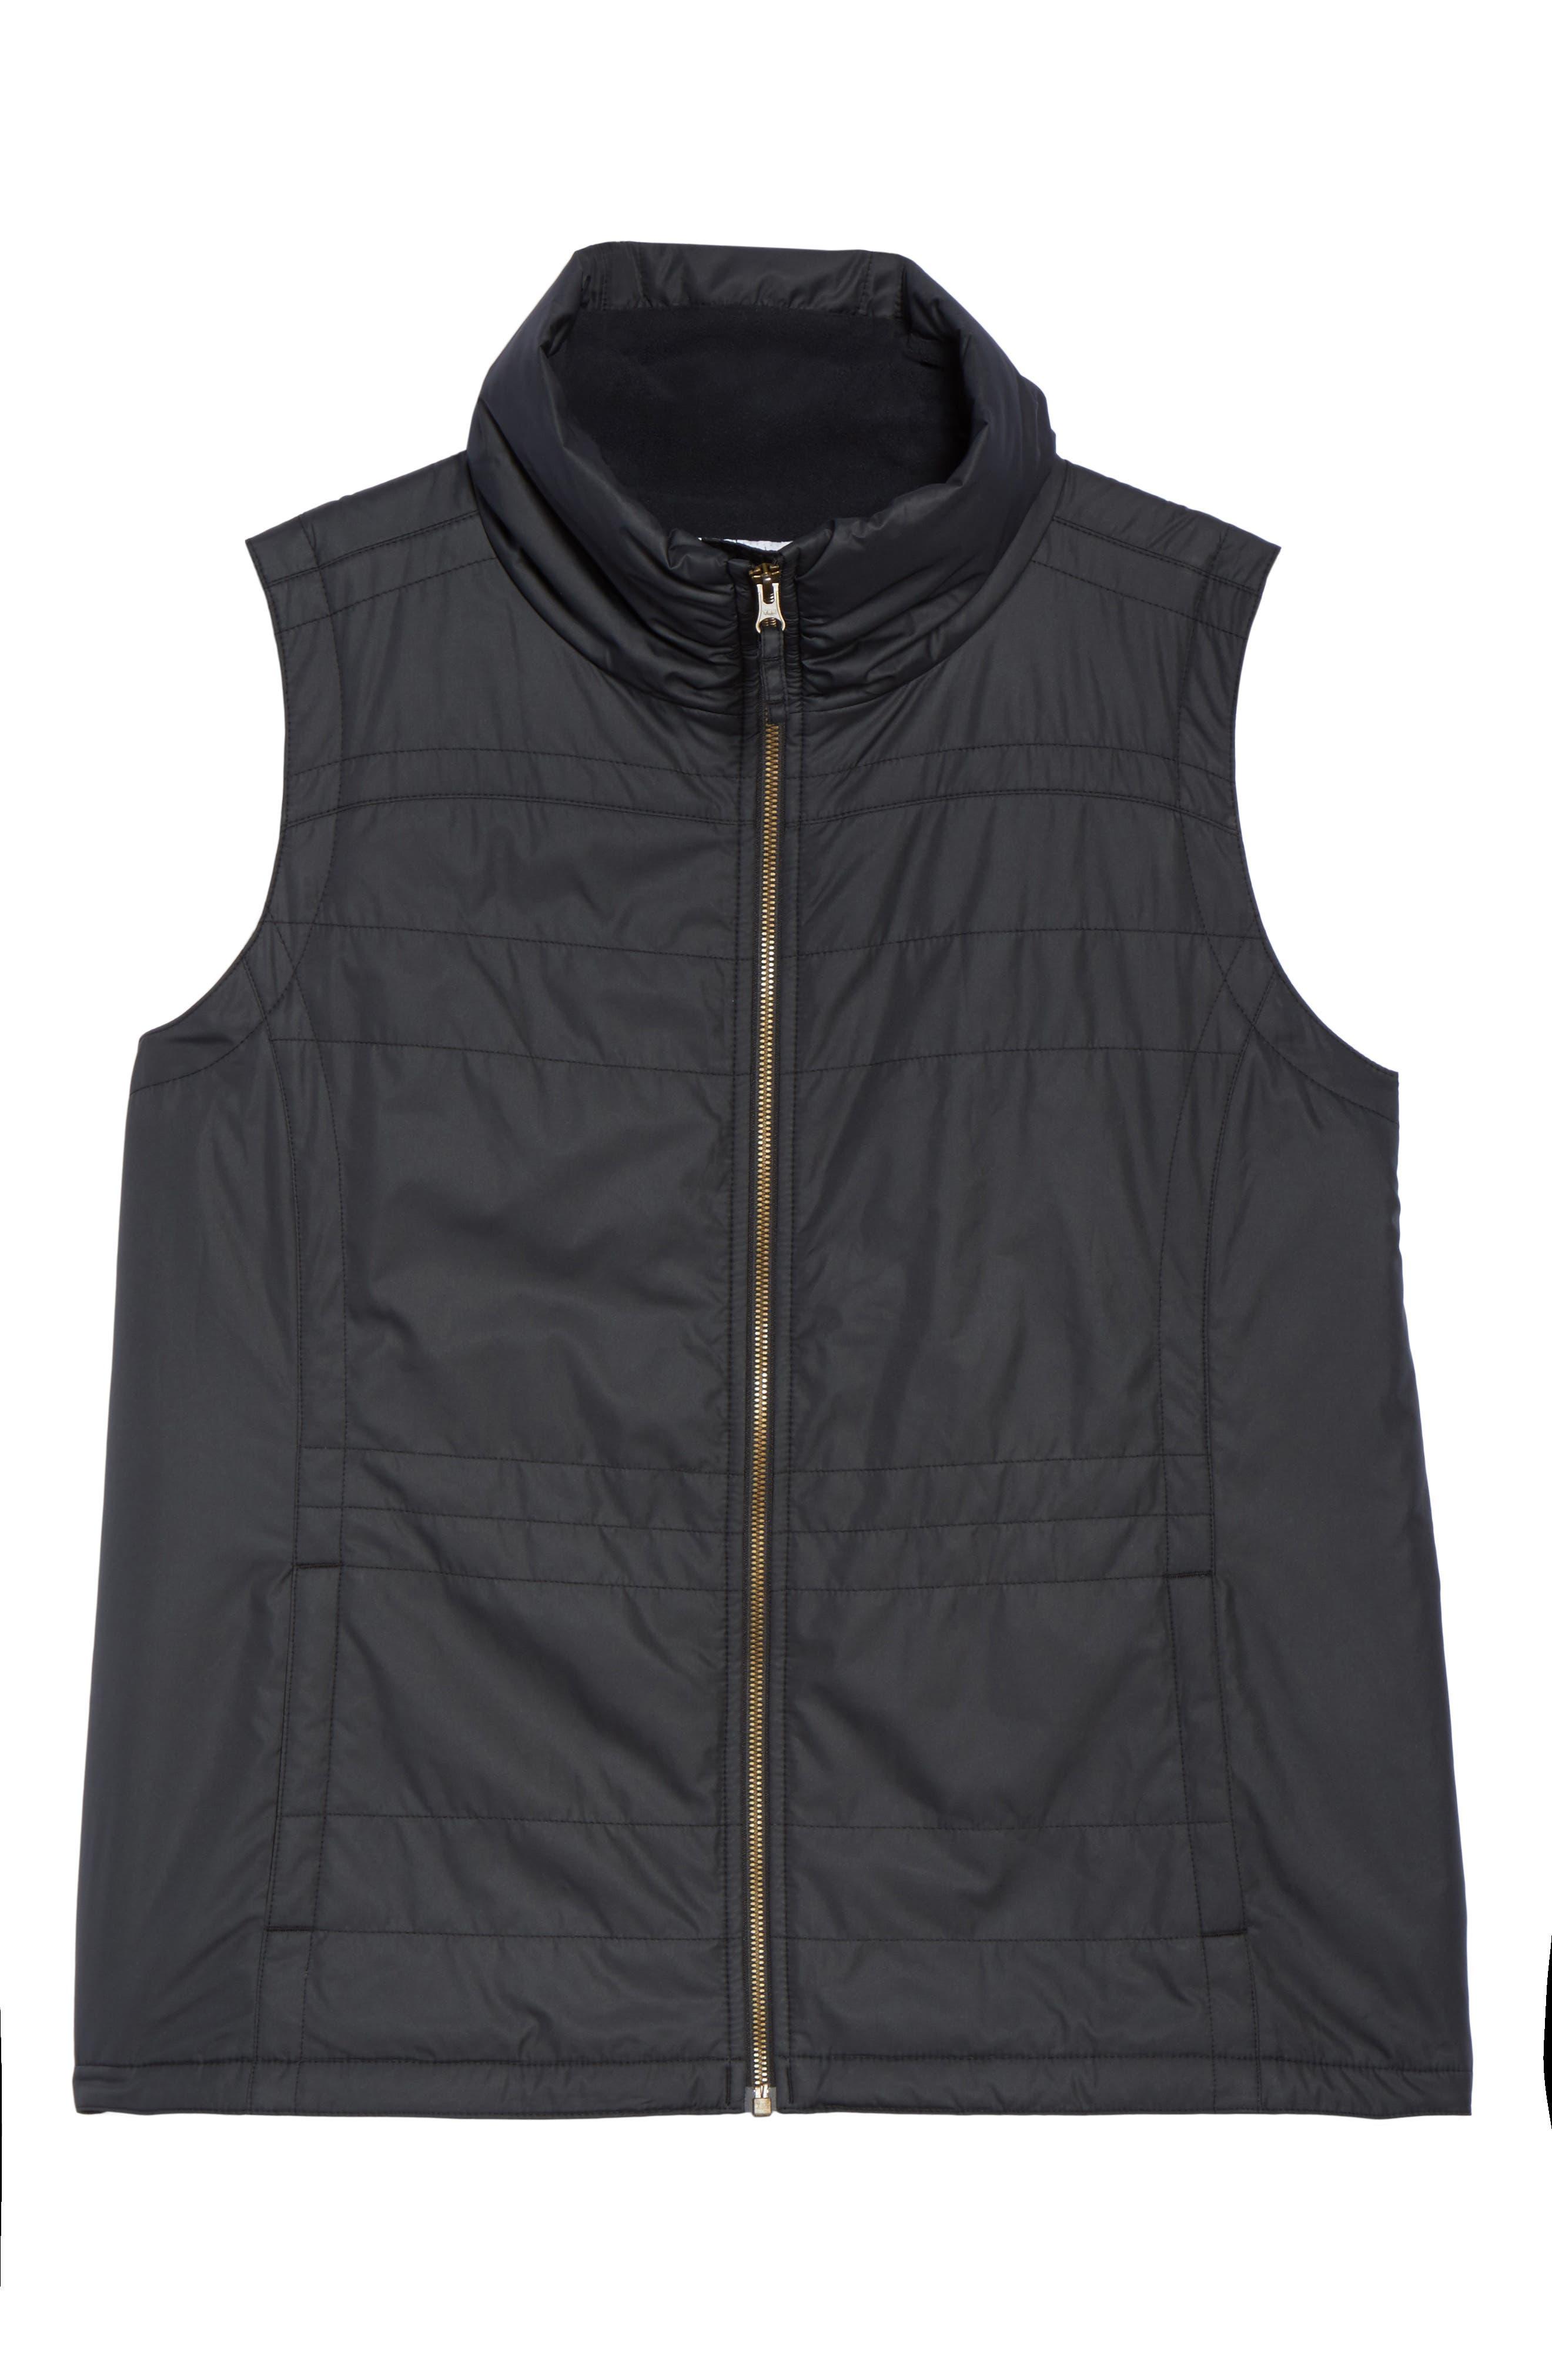 Shining Light II Quilted Vest,                             Alternate thumbnail 6, color,                             Black